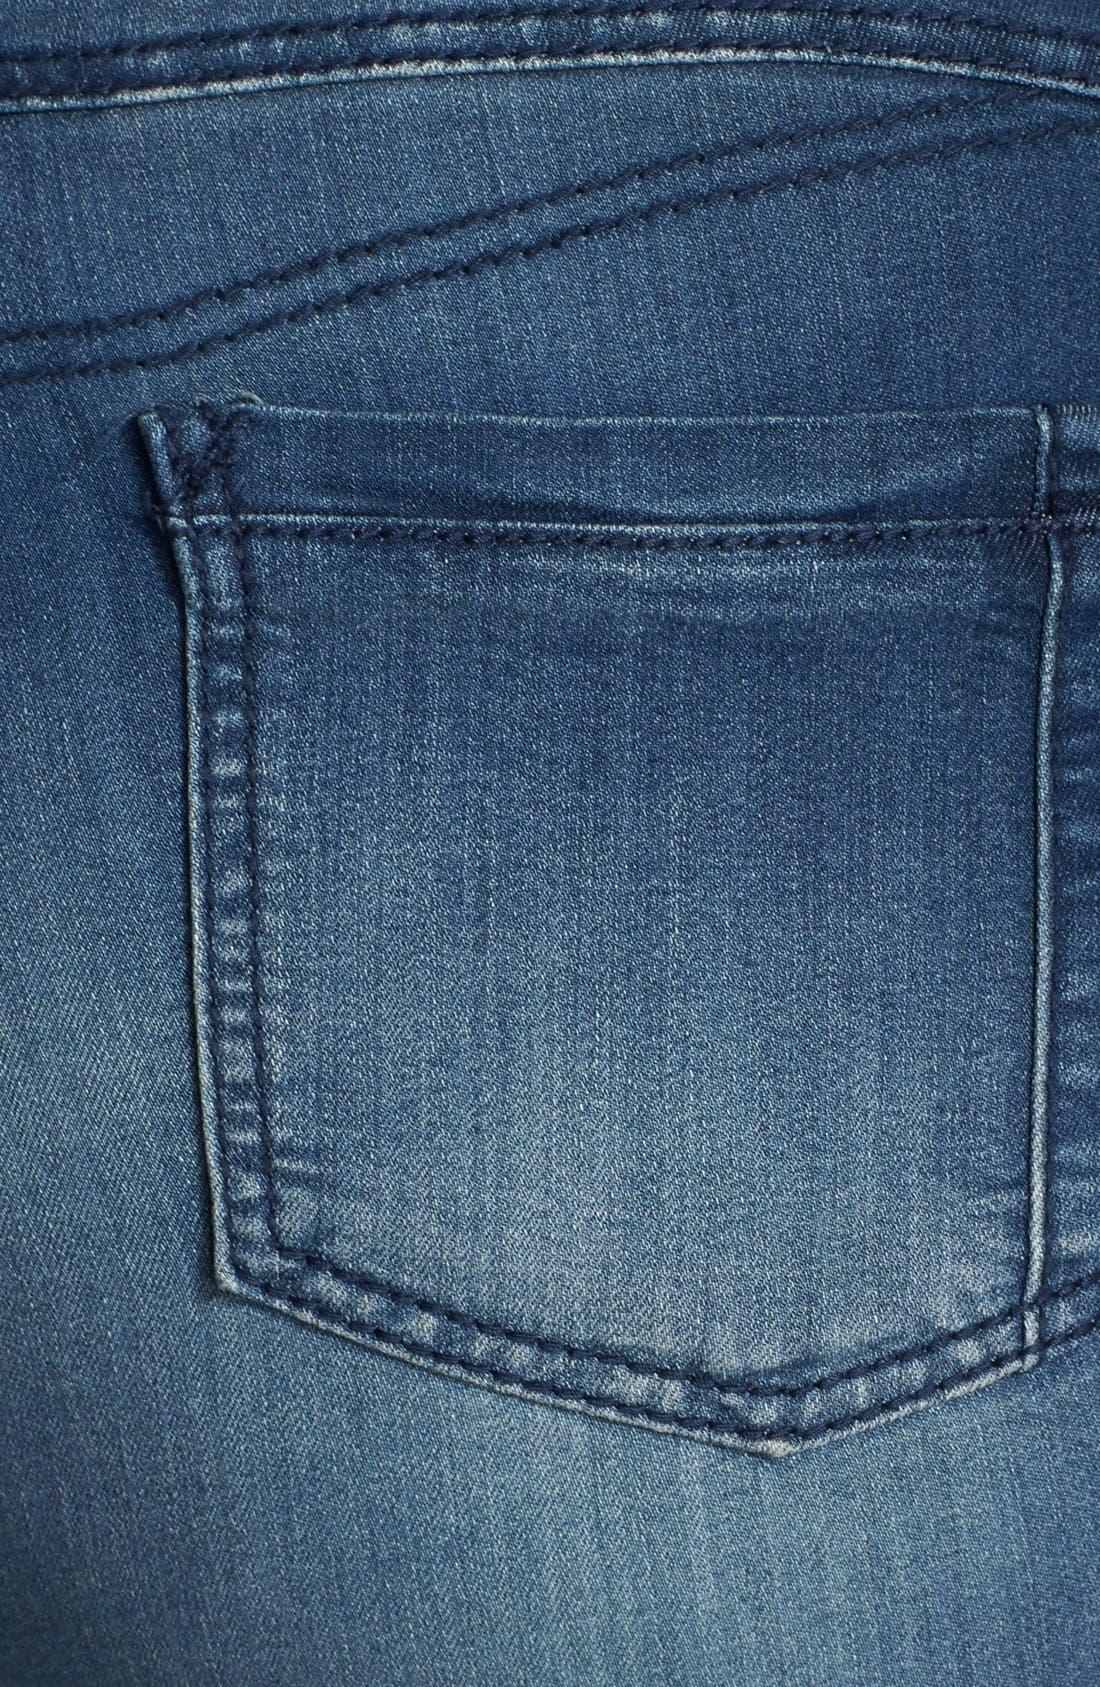 'Suzzie' Stretch Knit Denim Crop Jeans,                             Alternate thumbnail 3, color,                             DARK BLUE